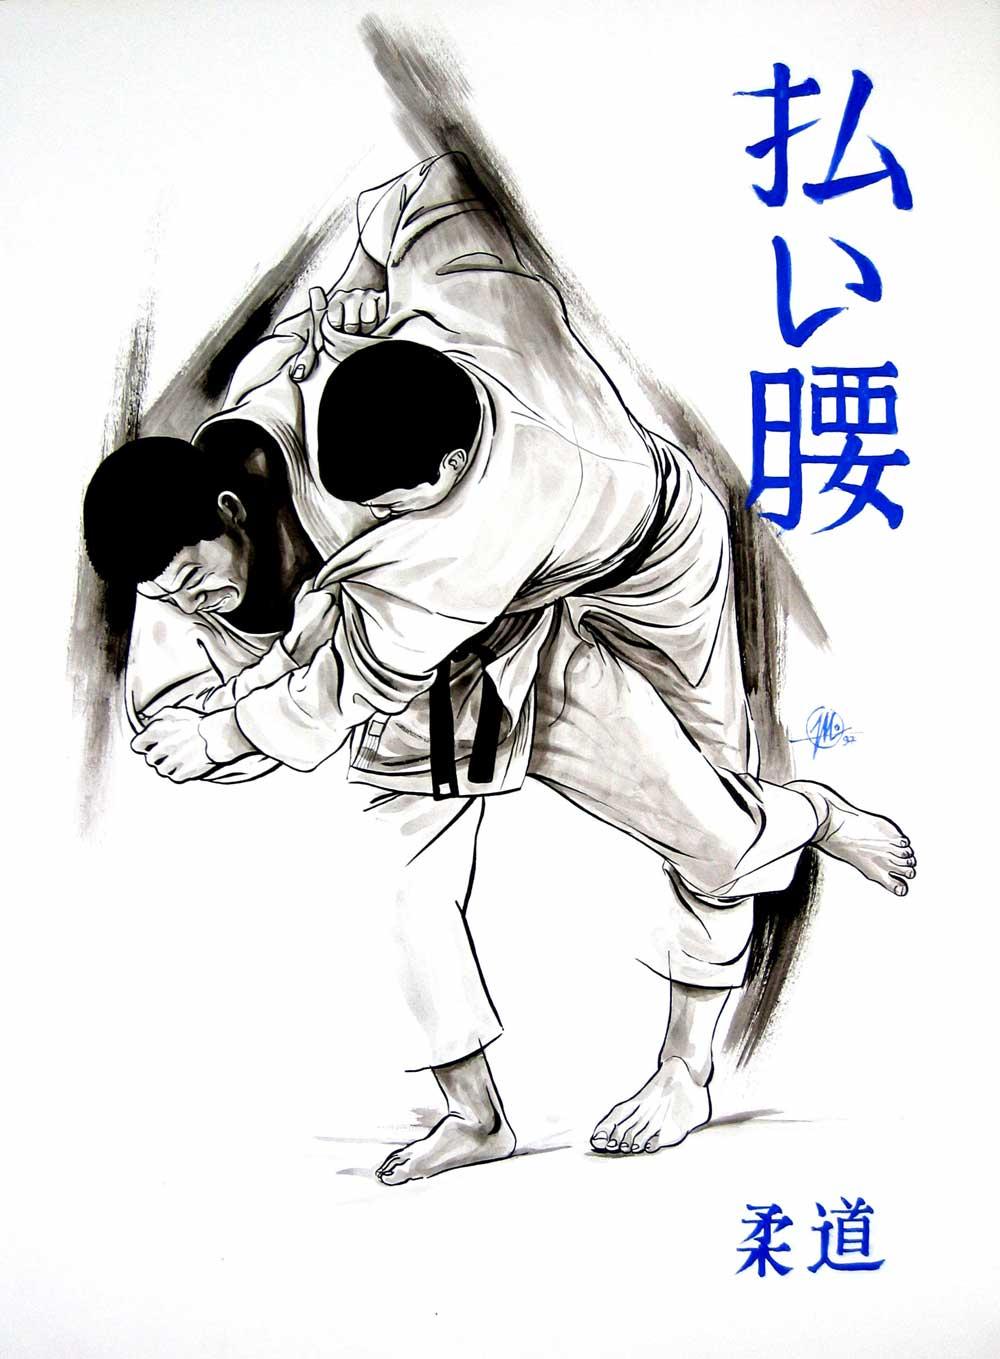 http://www.judoctj.com.br/wp-content/uploads/2010/02/Harai-goshi.jpg